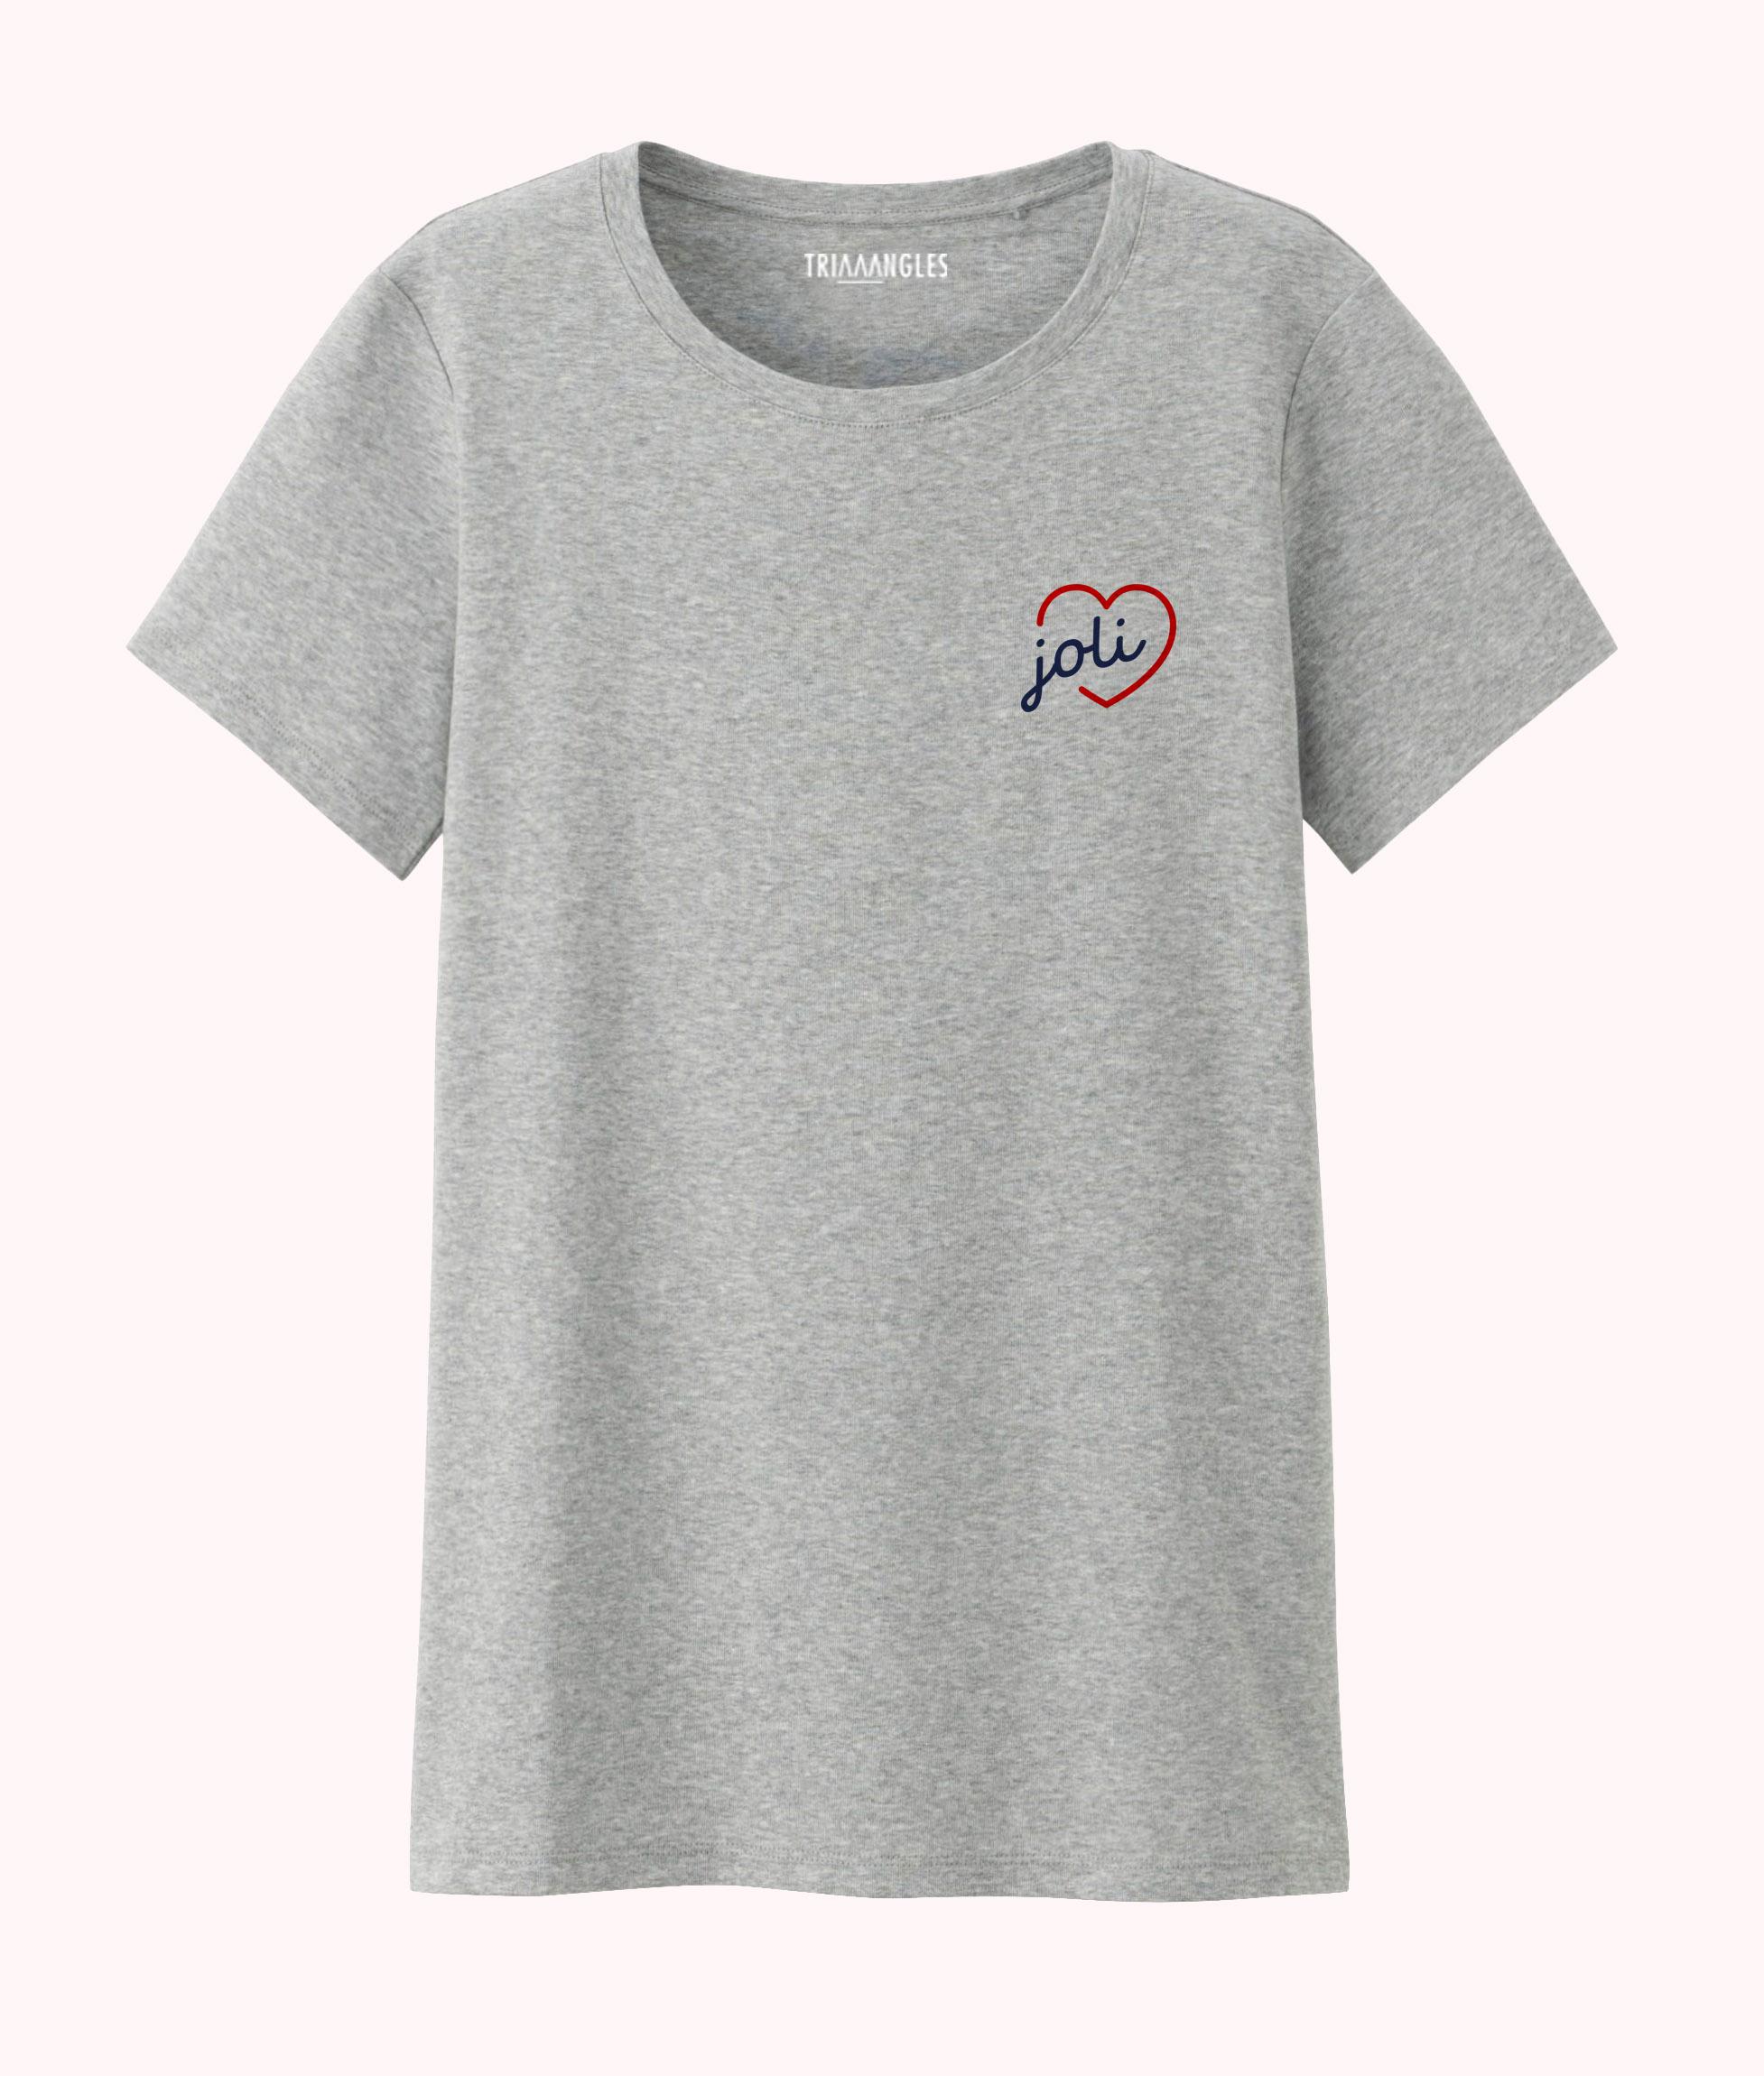 Tshirt gris chiné coupe femmeTriaaangles - Joli coeur -29€90